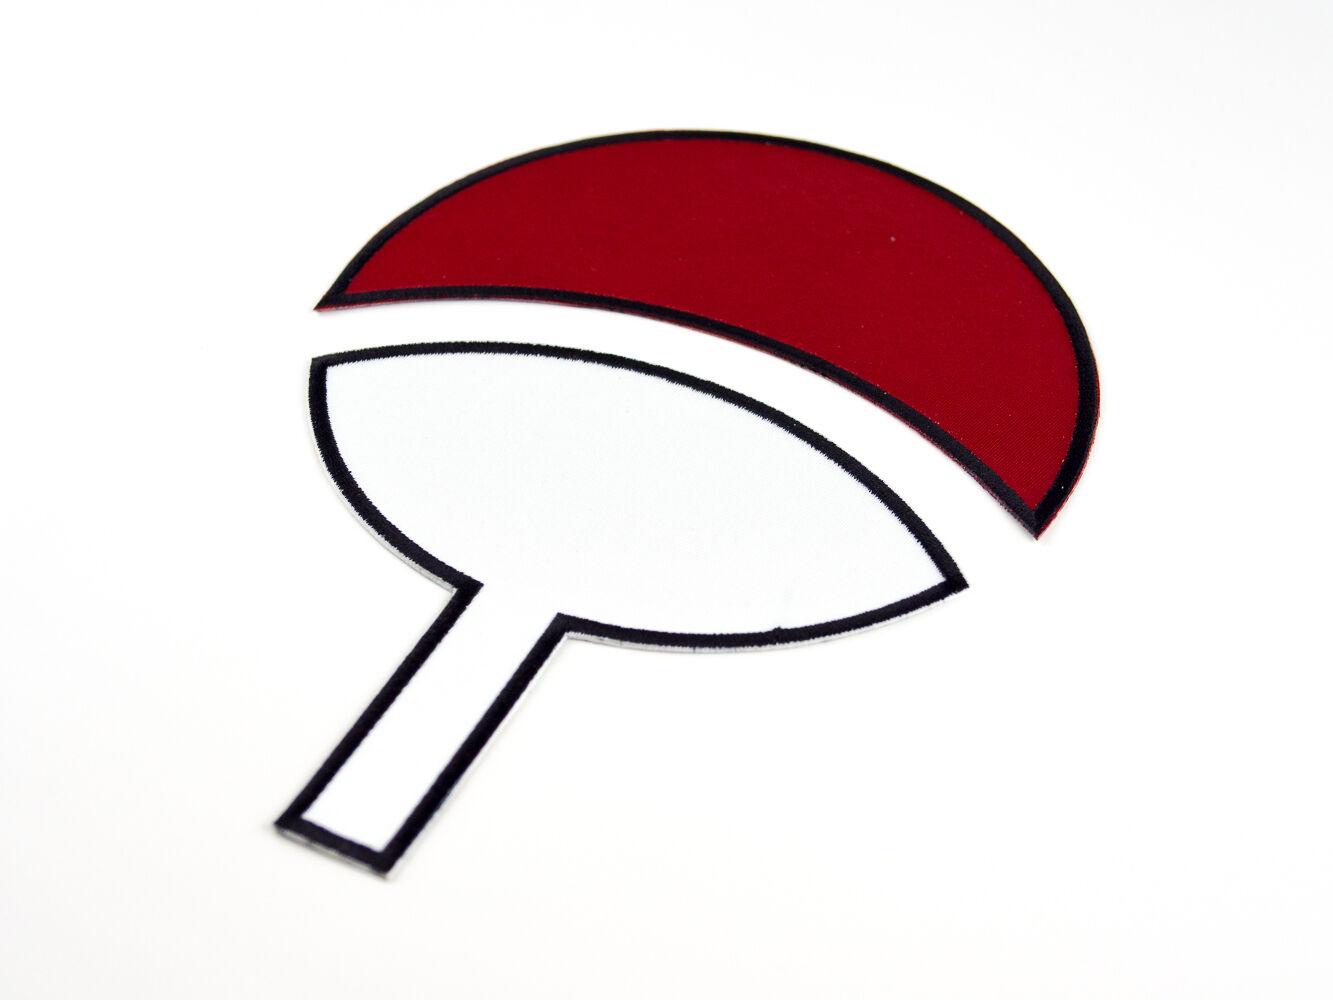 Small Uchiha Clan Symbol Naruto Embroidered Iron On Patch Iron On